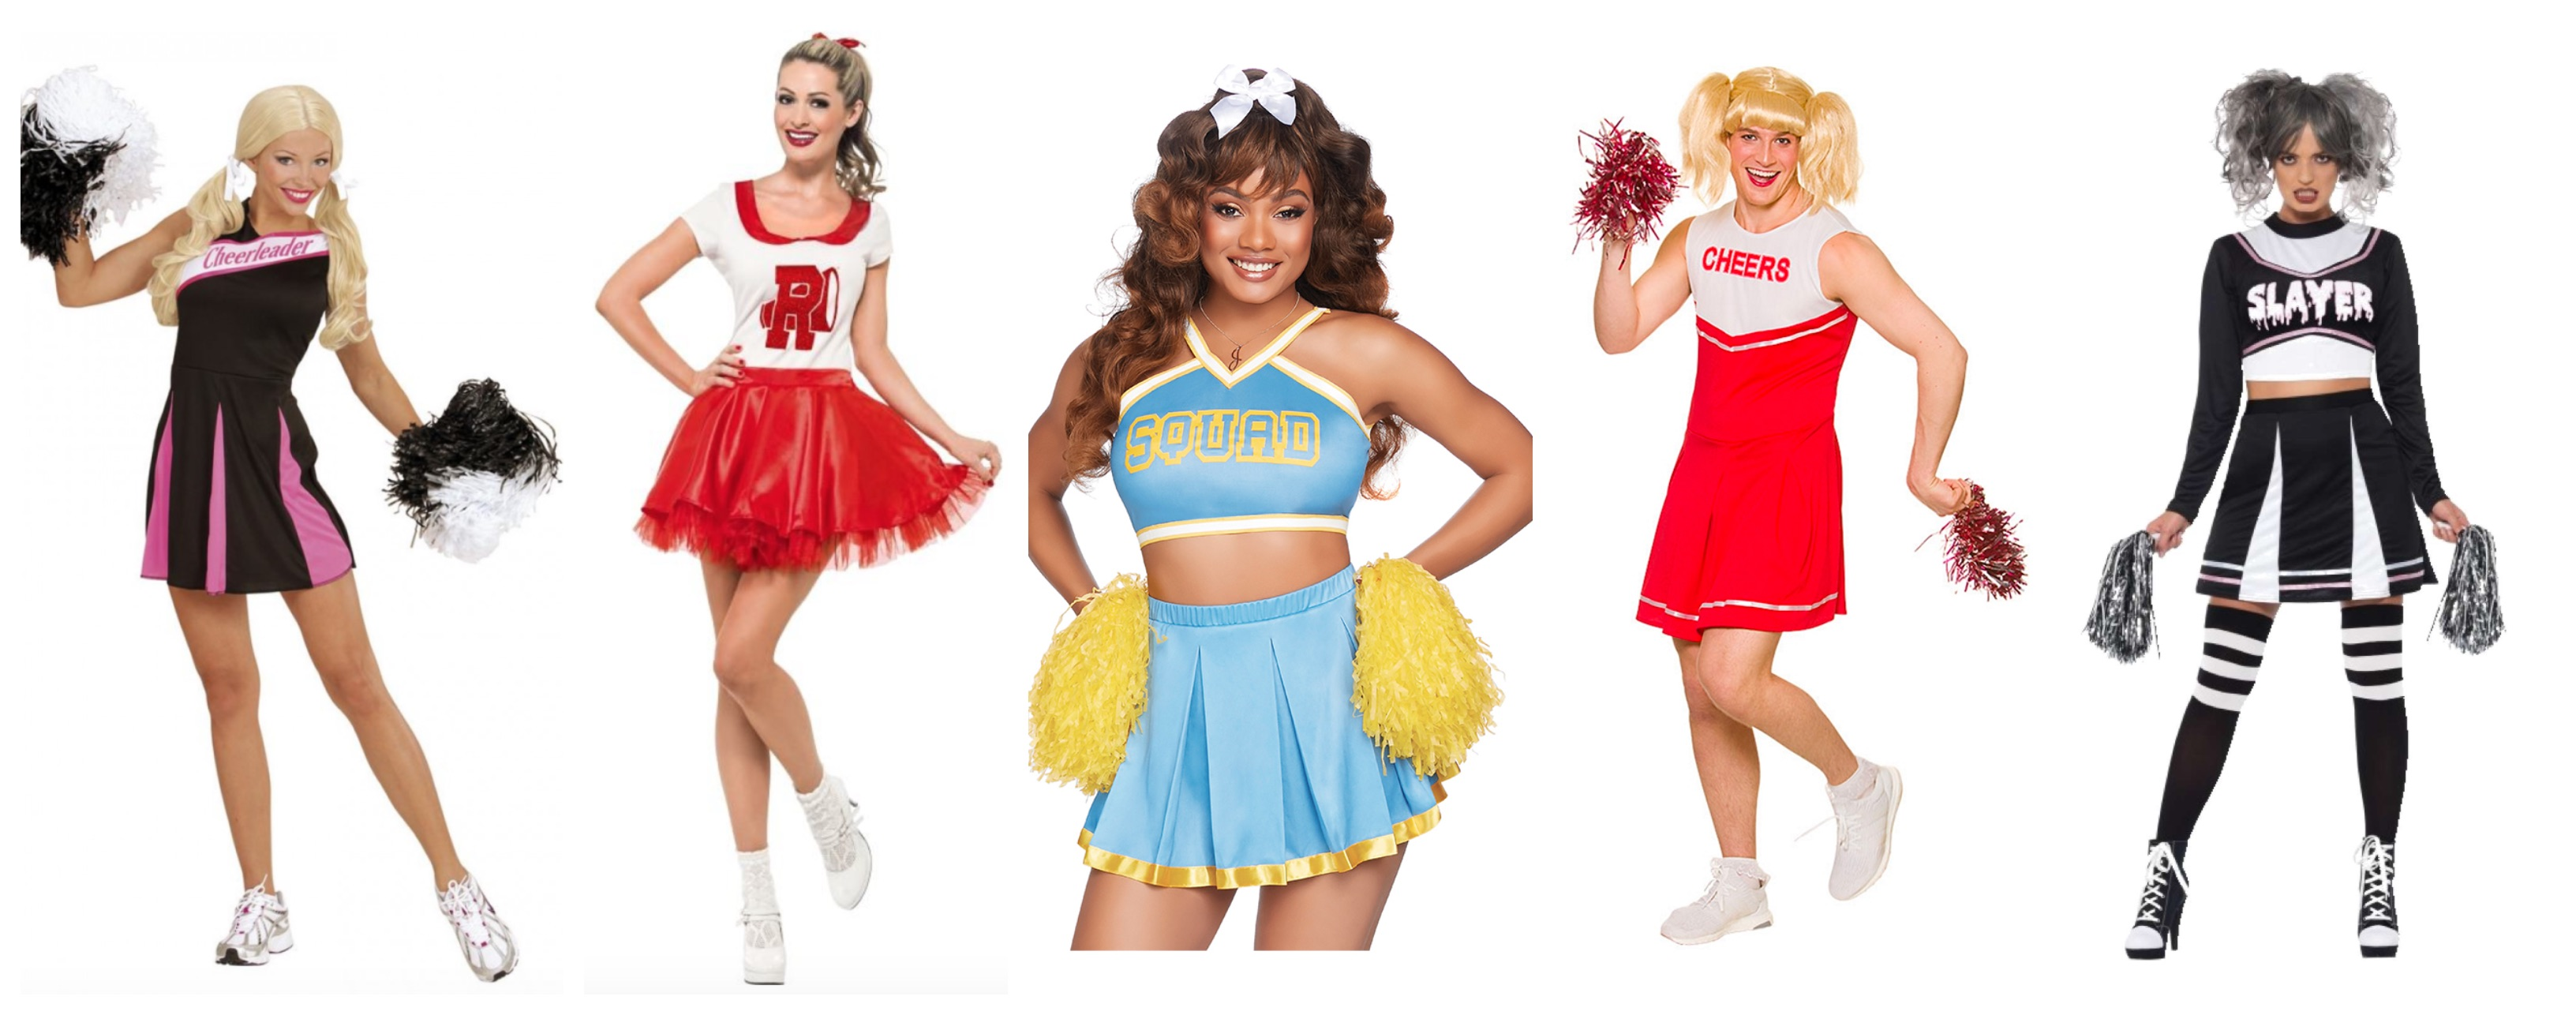 cheerleader kostume til voksne - Cheerleader kostume til voksne